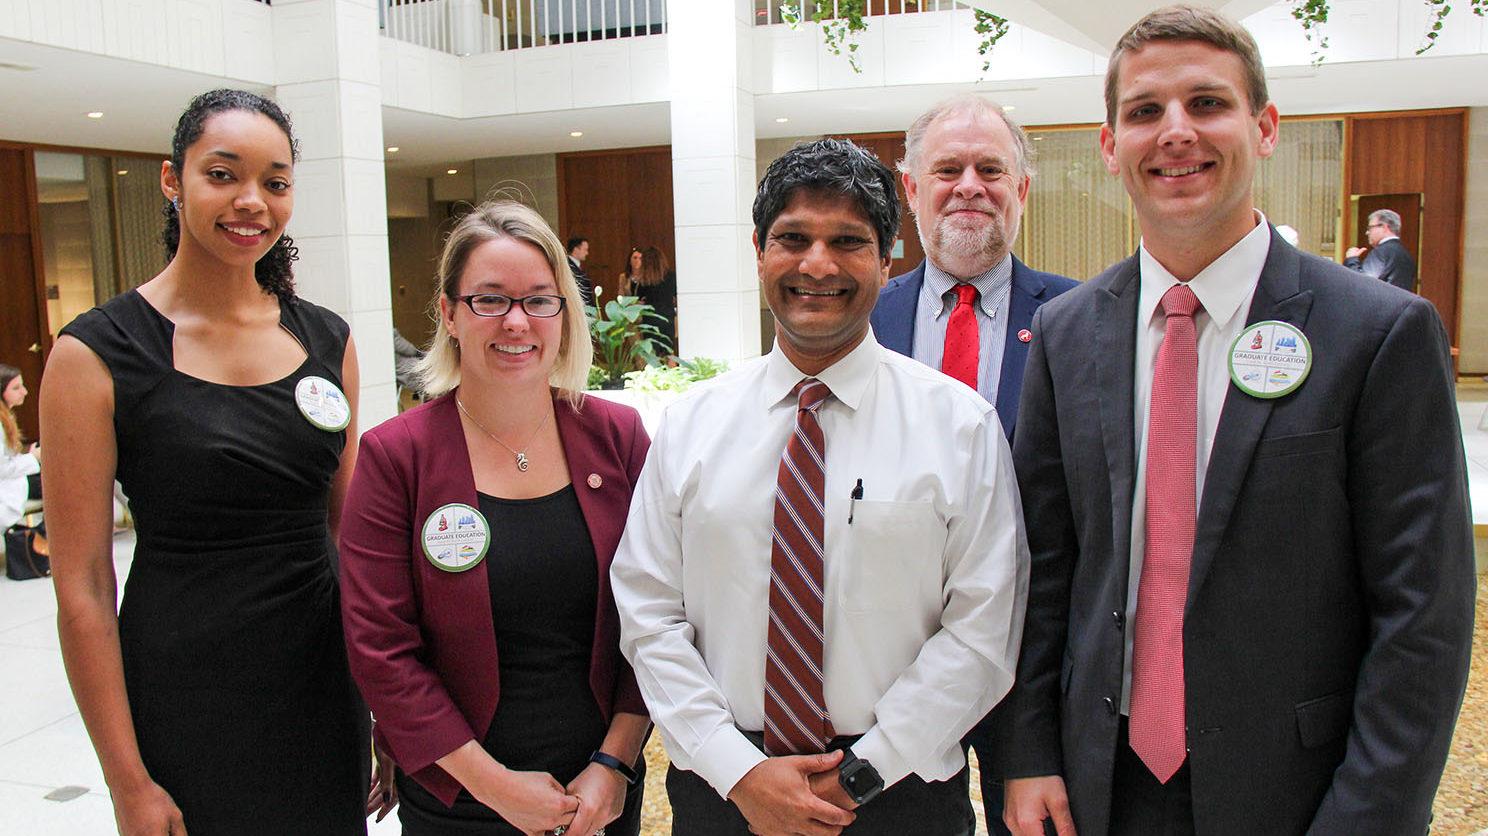 group at the legislature